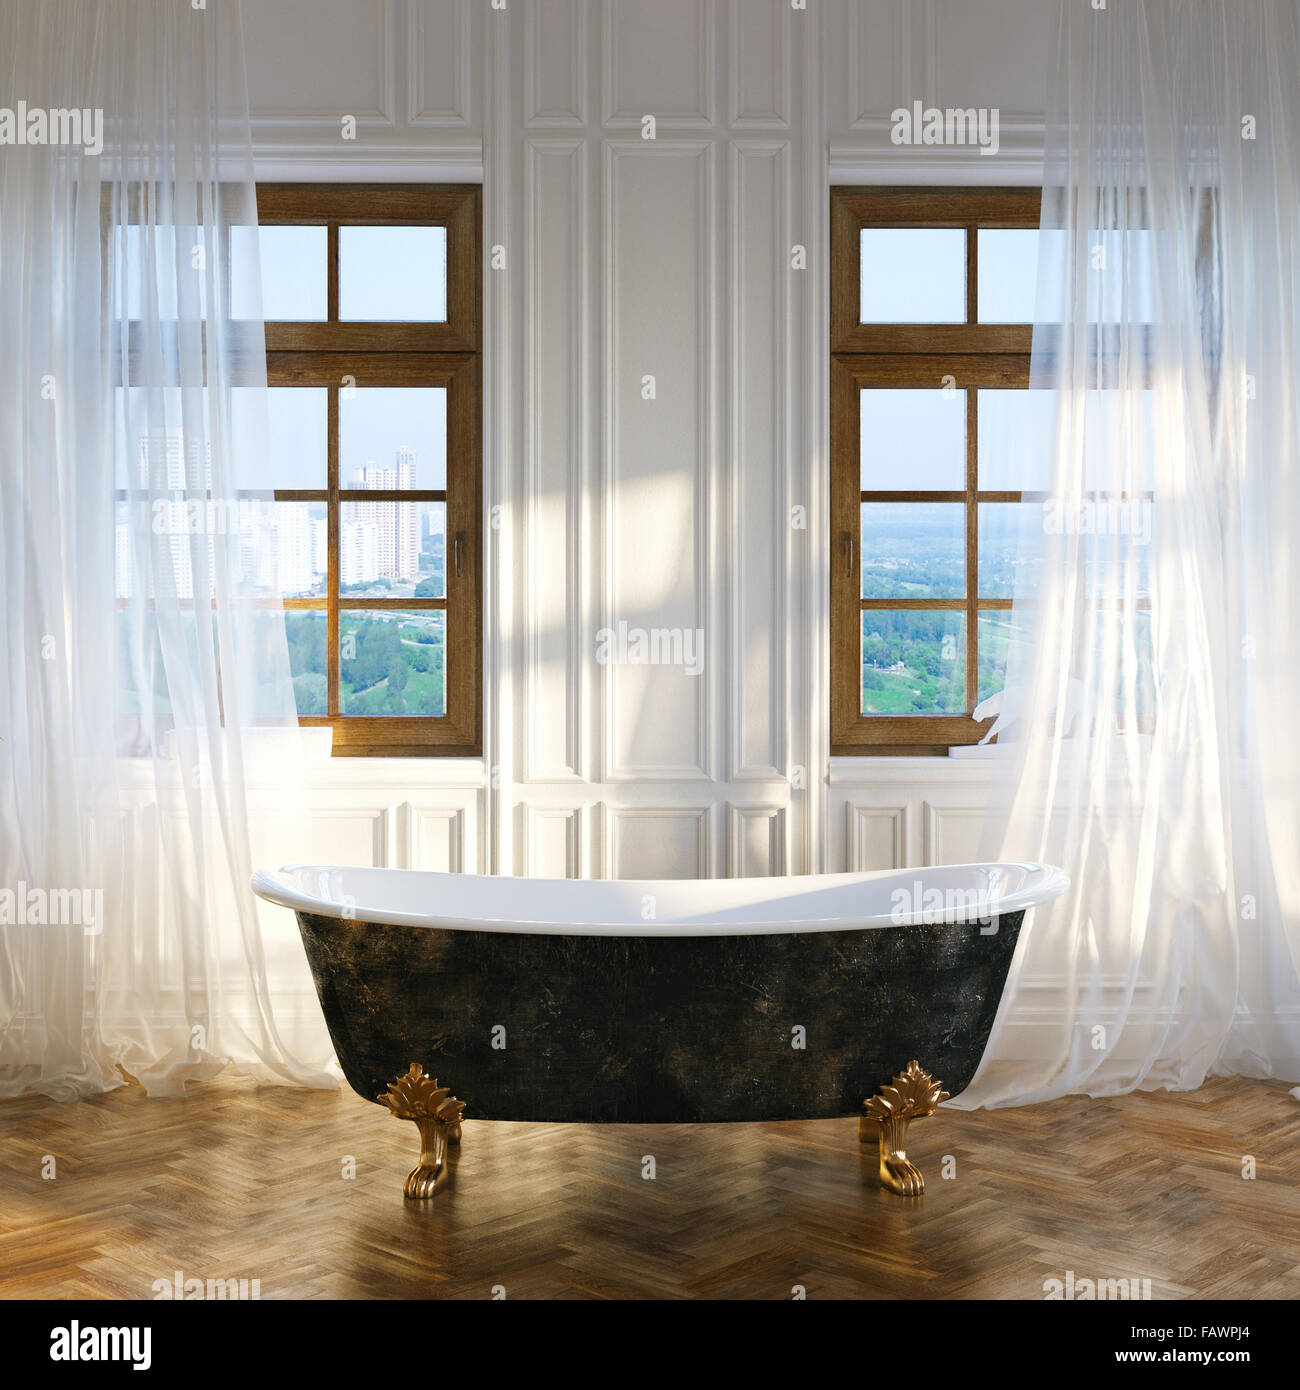 Big bathroom with vintage iron bathtub in center and big windows in ...